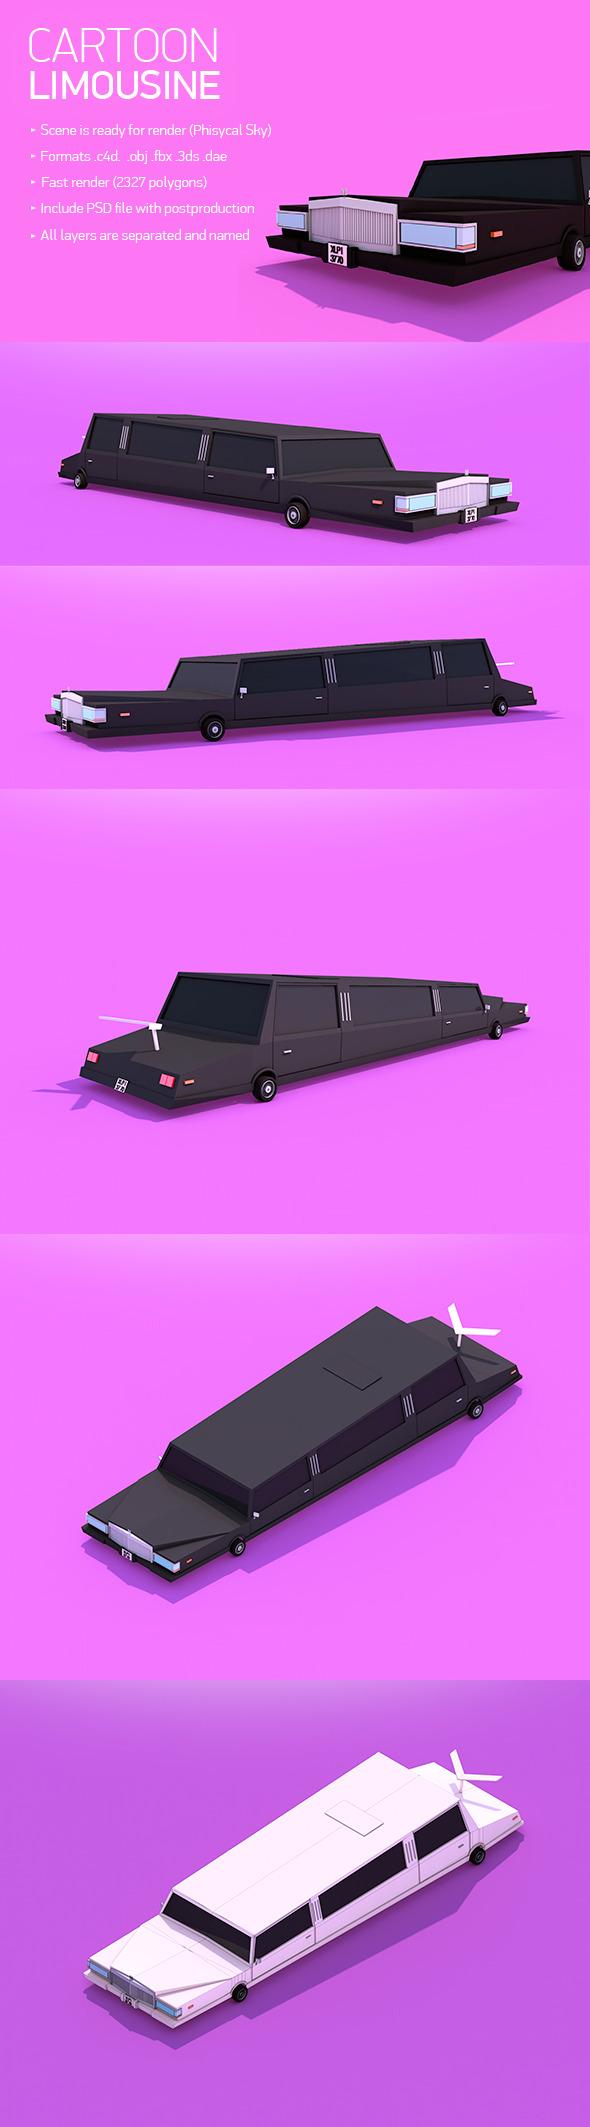 Cartoon Limousine - 3DOcean Item for Sale